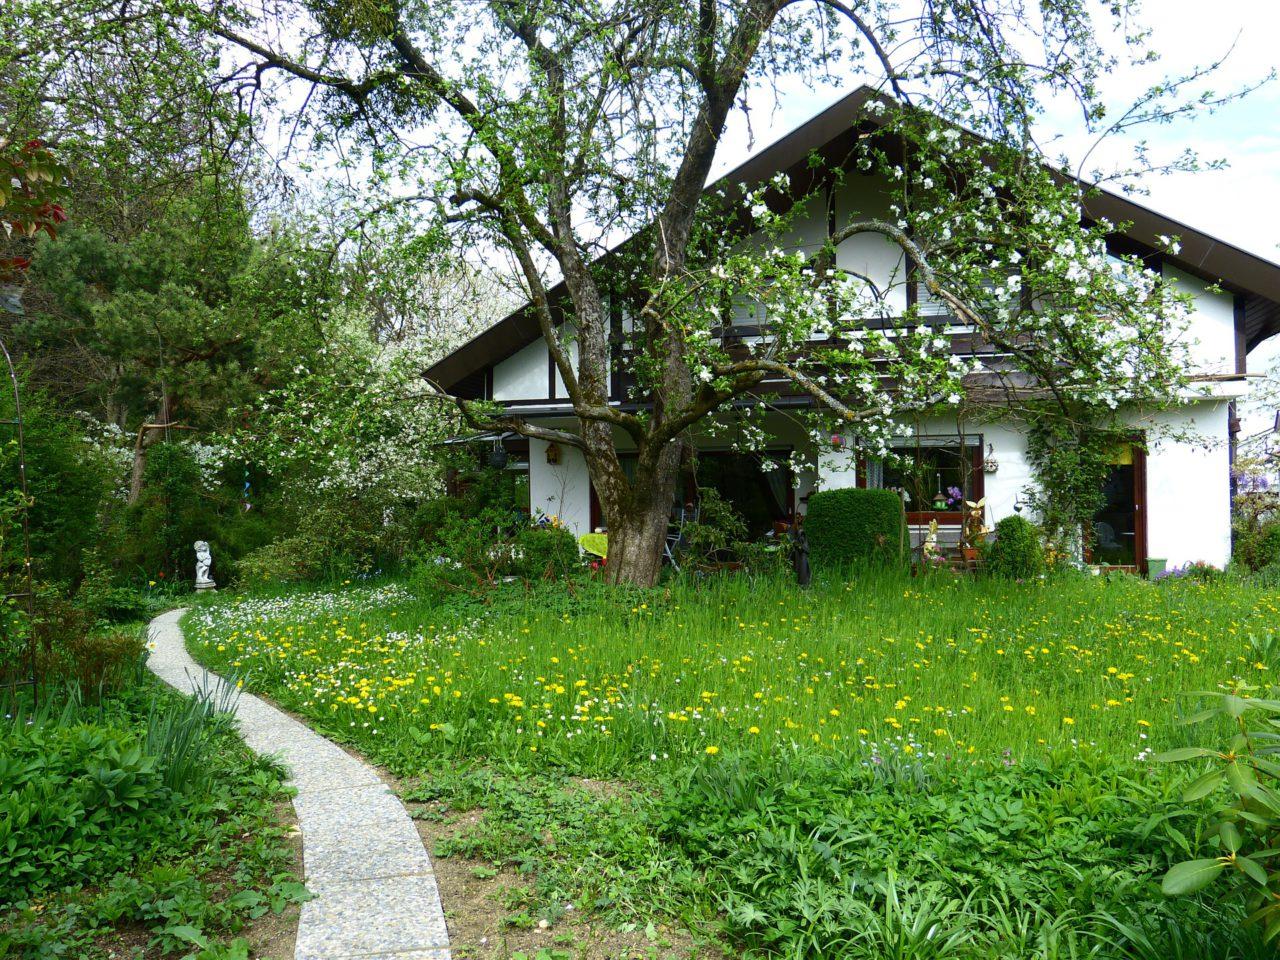 house-634483_1920-1280x960.jpg